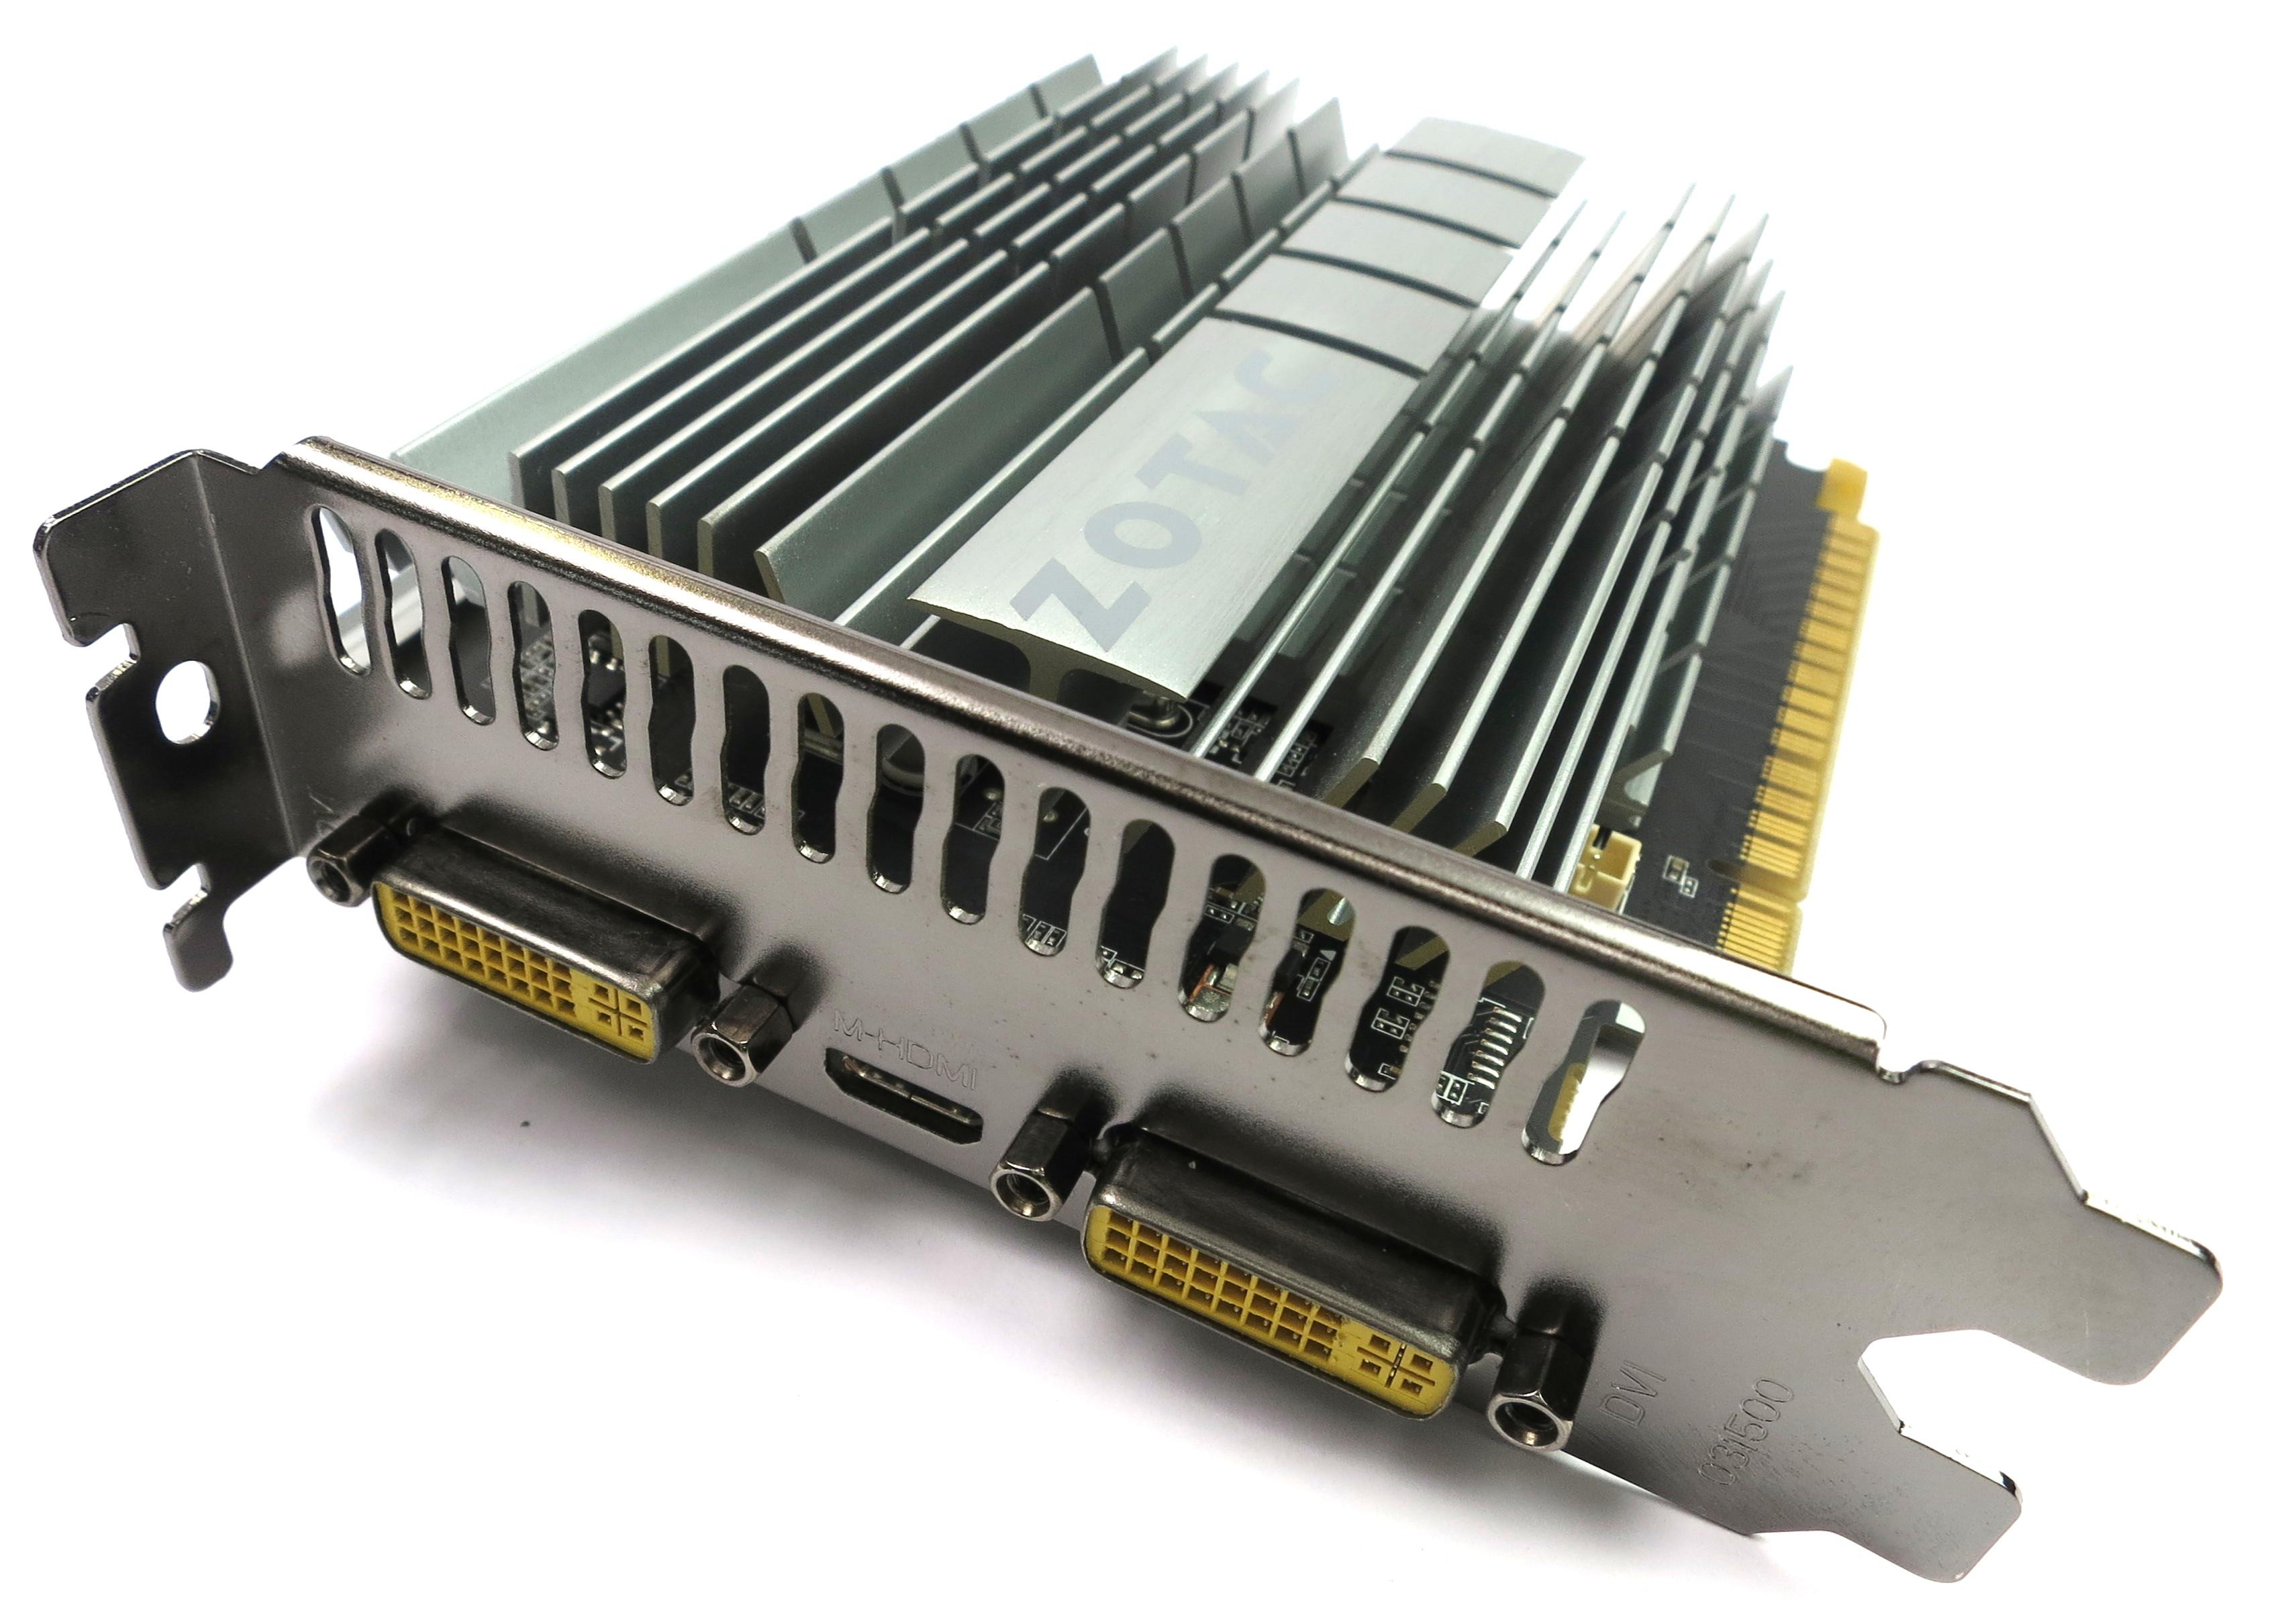 Zotac GT 610 Zone Edition 1GB DRR3 PCI-E Graphics Card 299-5N215-010ZT